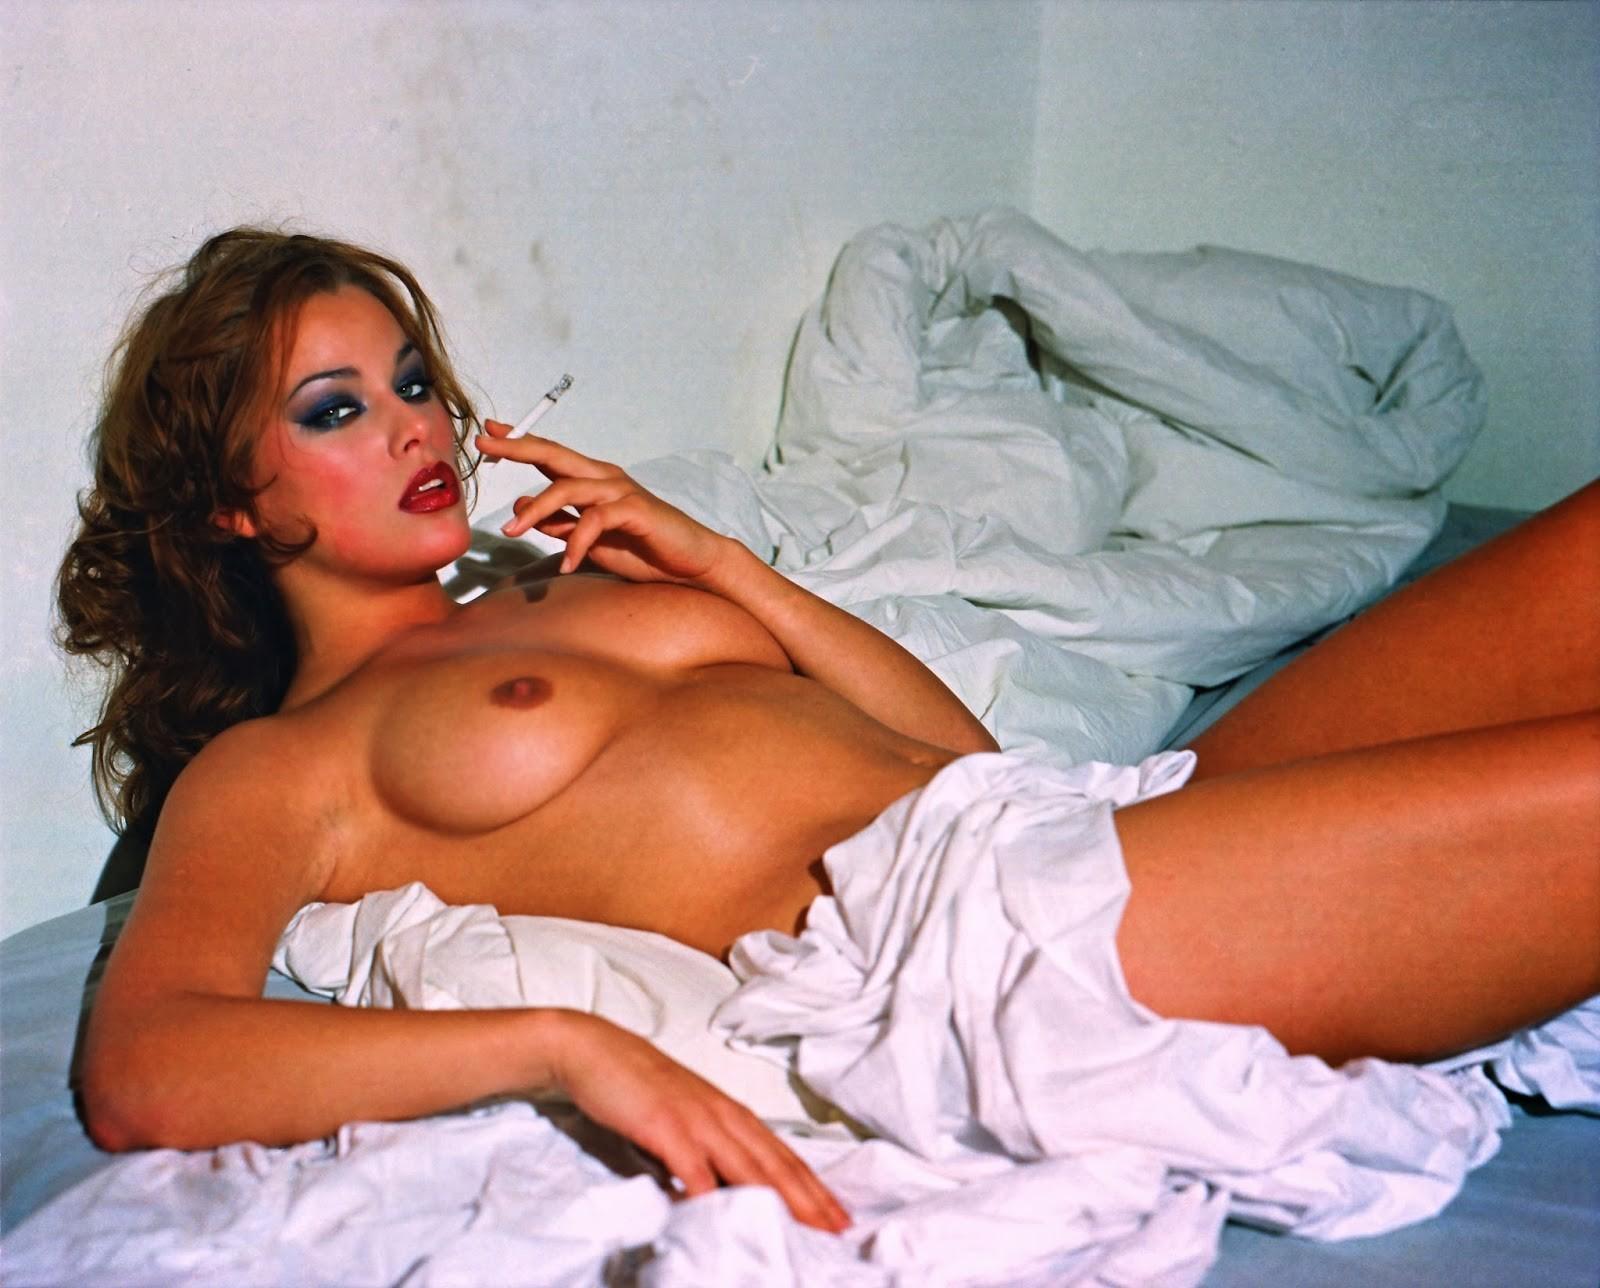 Melania trump nude sexy pics new pictures